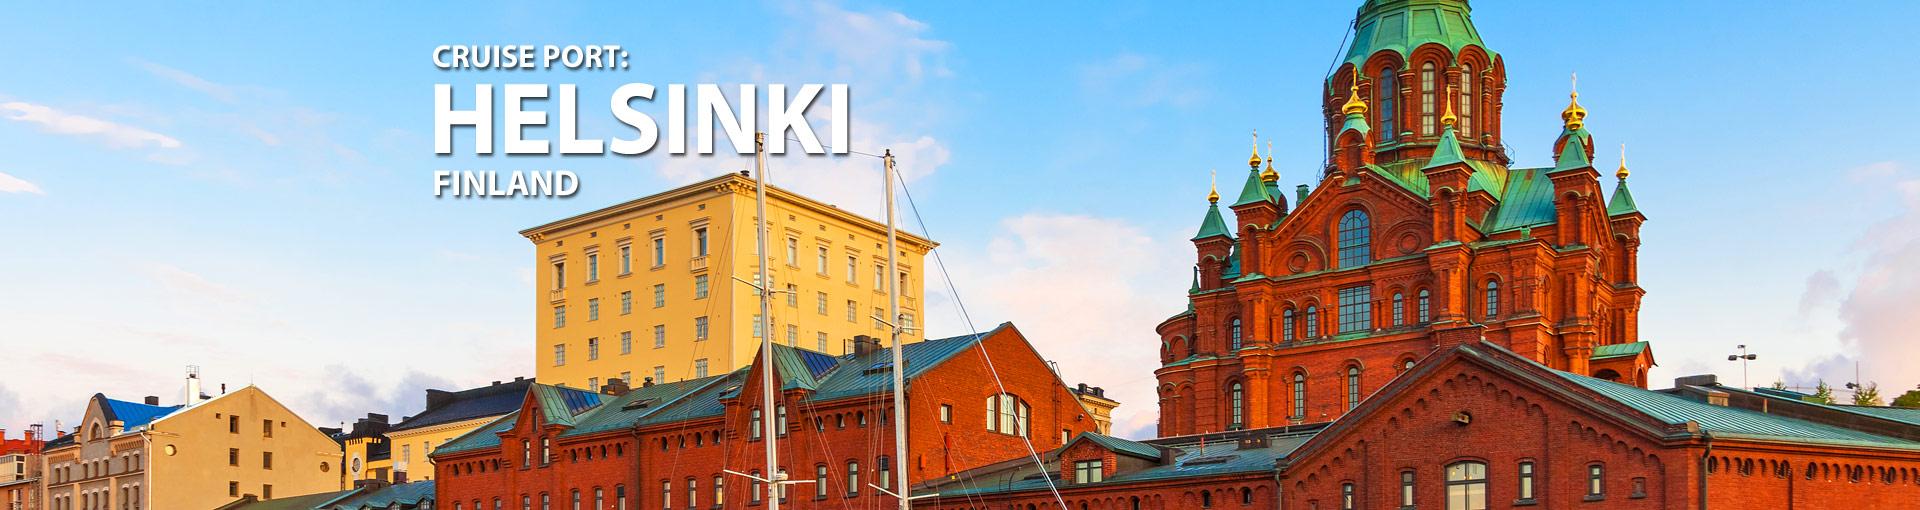 helsinki-finland-cruise-port-banner